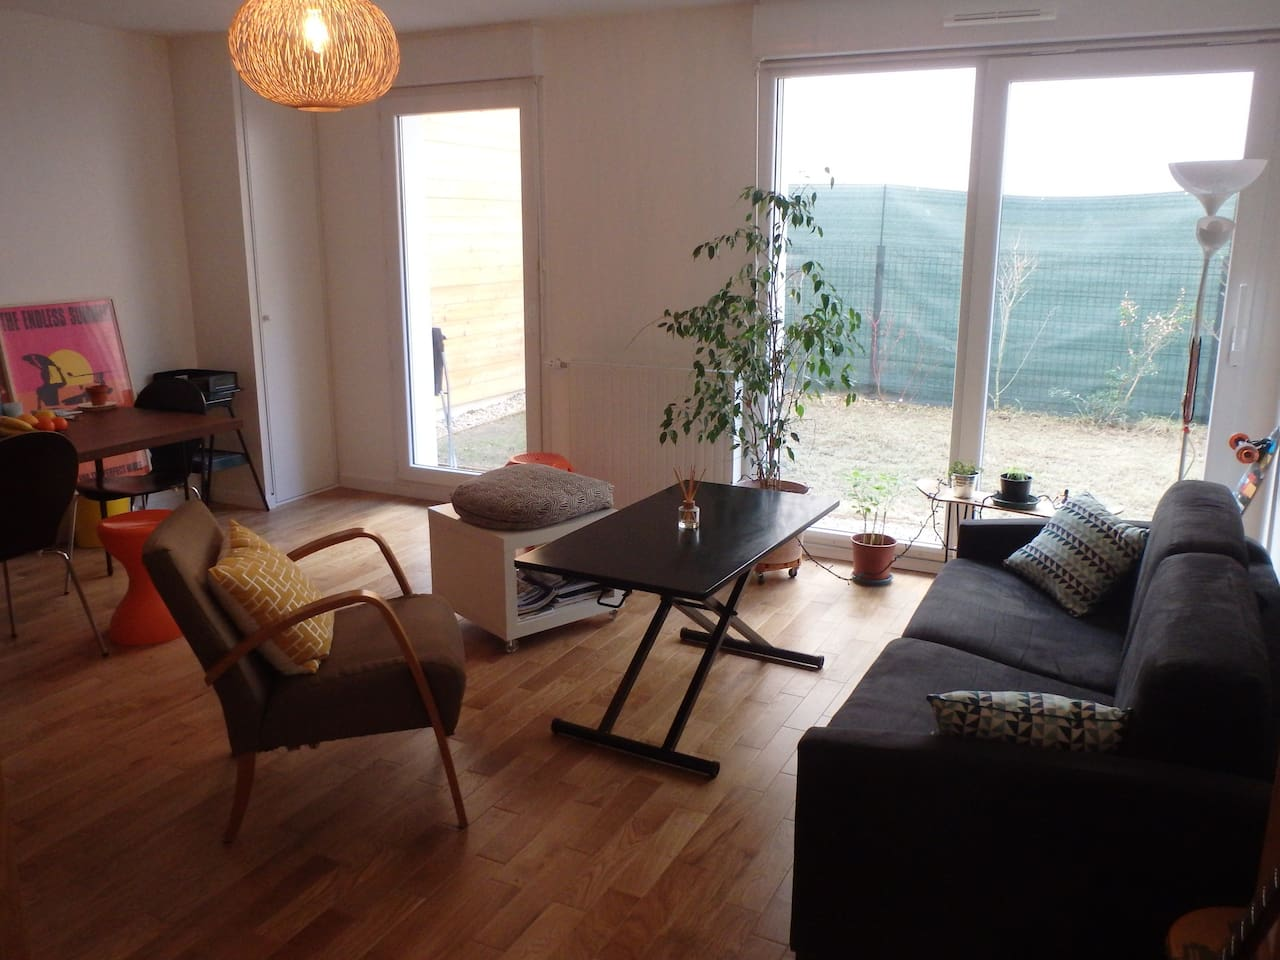 Appartement calme avec jardin / Quiet appartment with garden